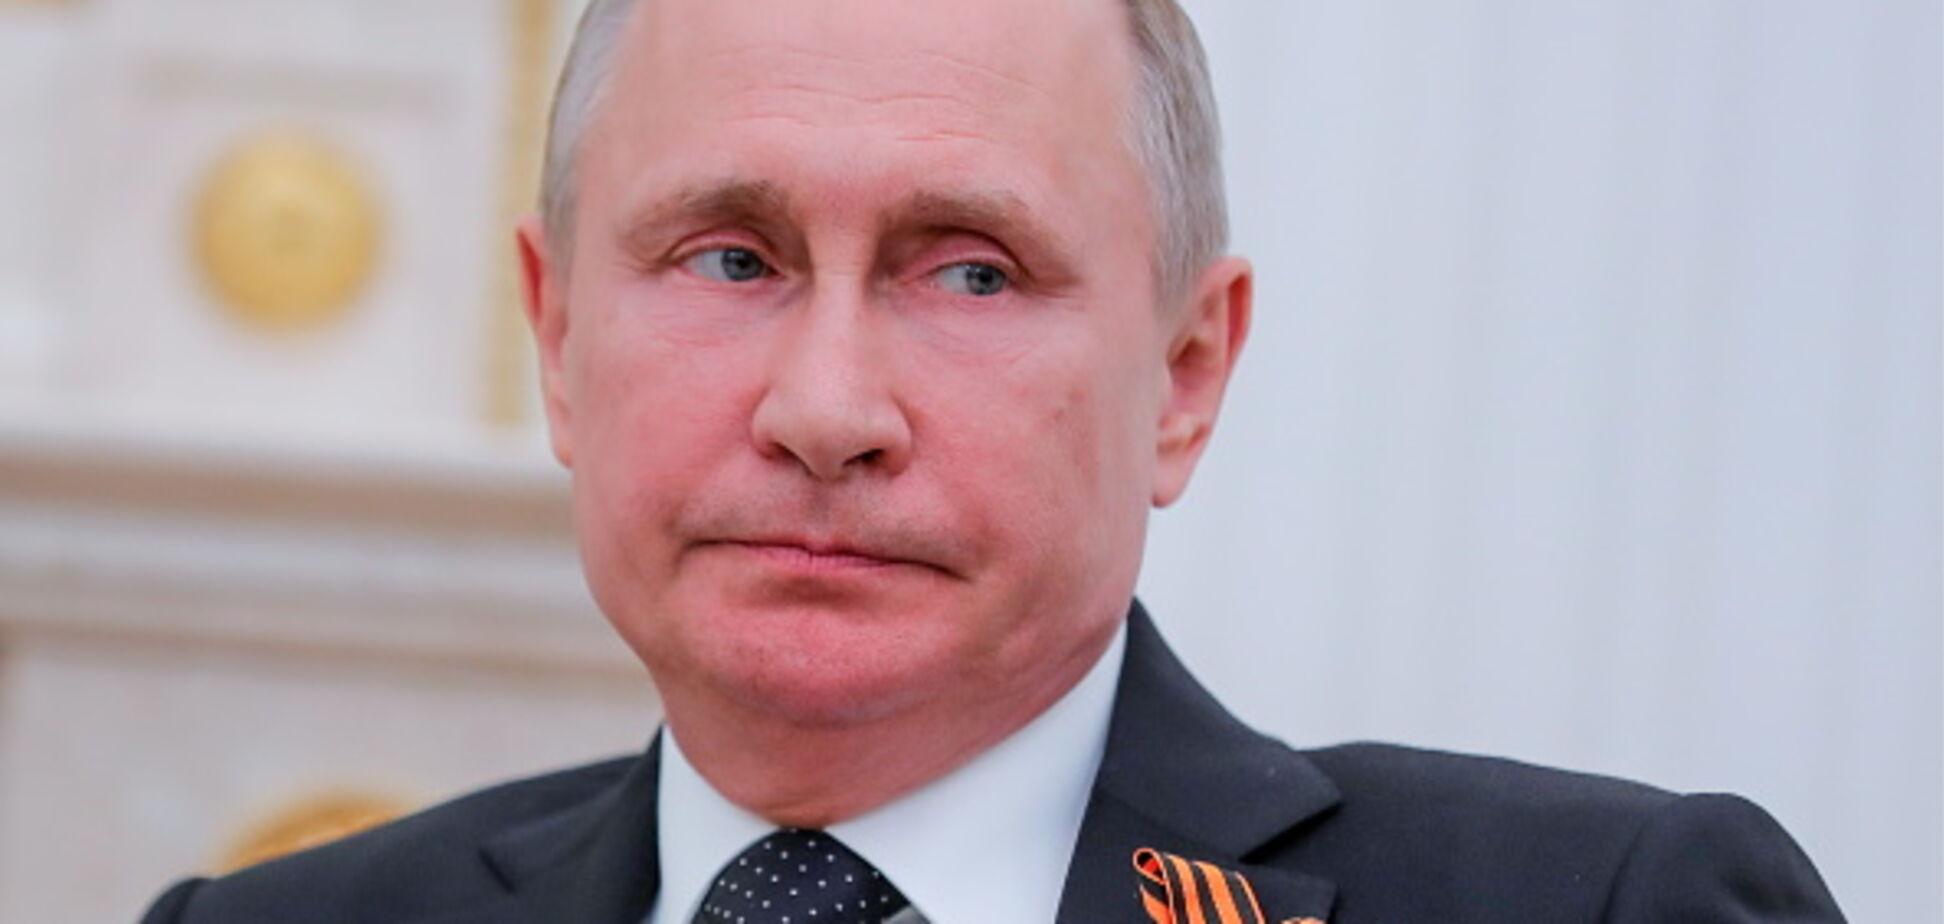 Зреет заговор: журналист назвал имя преемника Путина